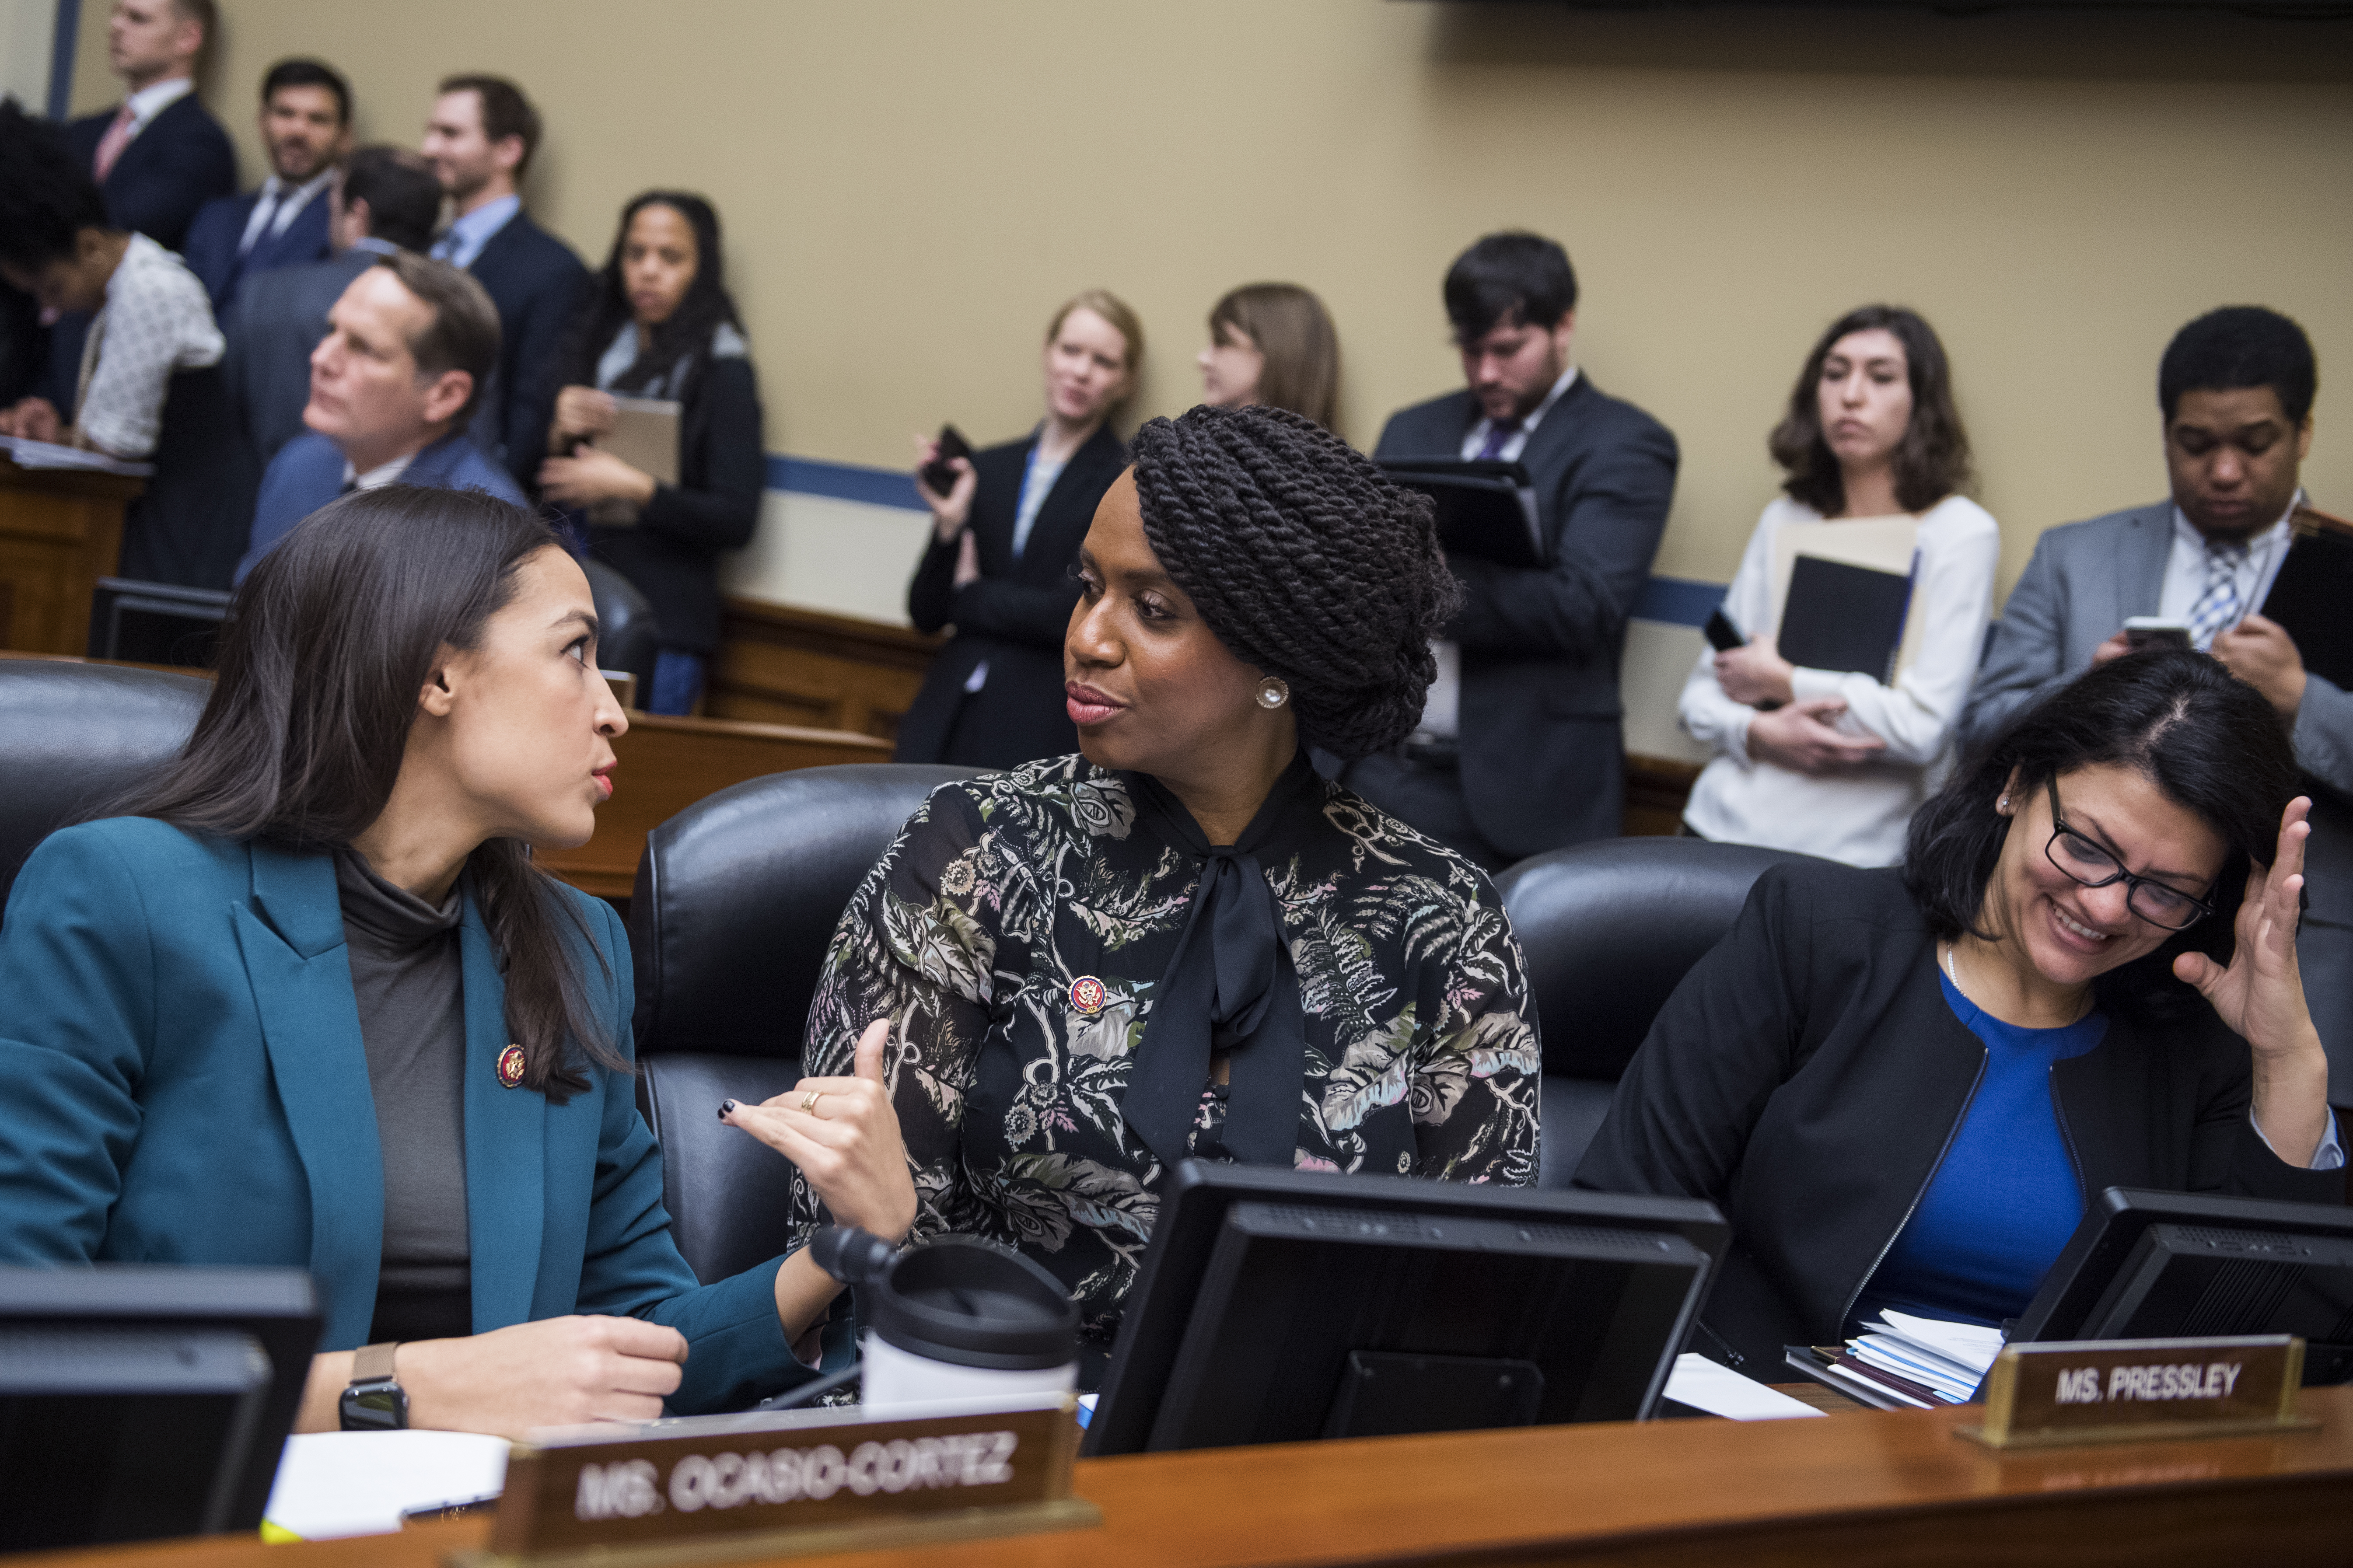 Reps. Alexandria Ocasio-Cortez, D-N.Y., Ayanna Pressley, D-Mass., and Rashida Tlaib, D-Mich., attend a meeting in Rayburn Building on Jan. 29, 2019.